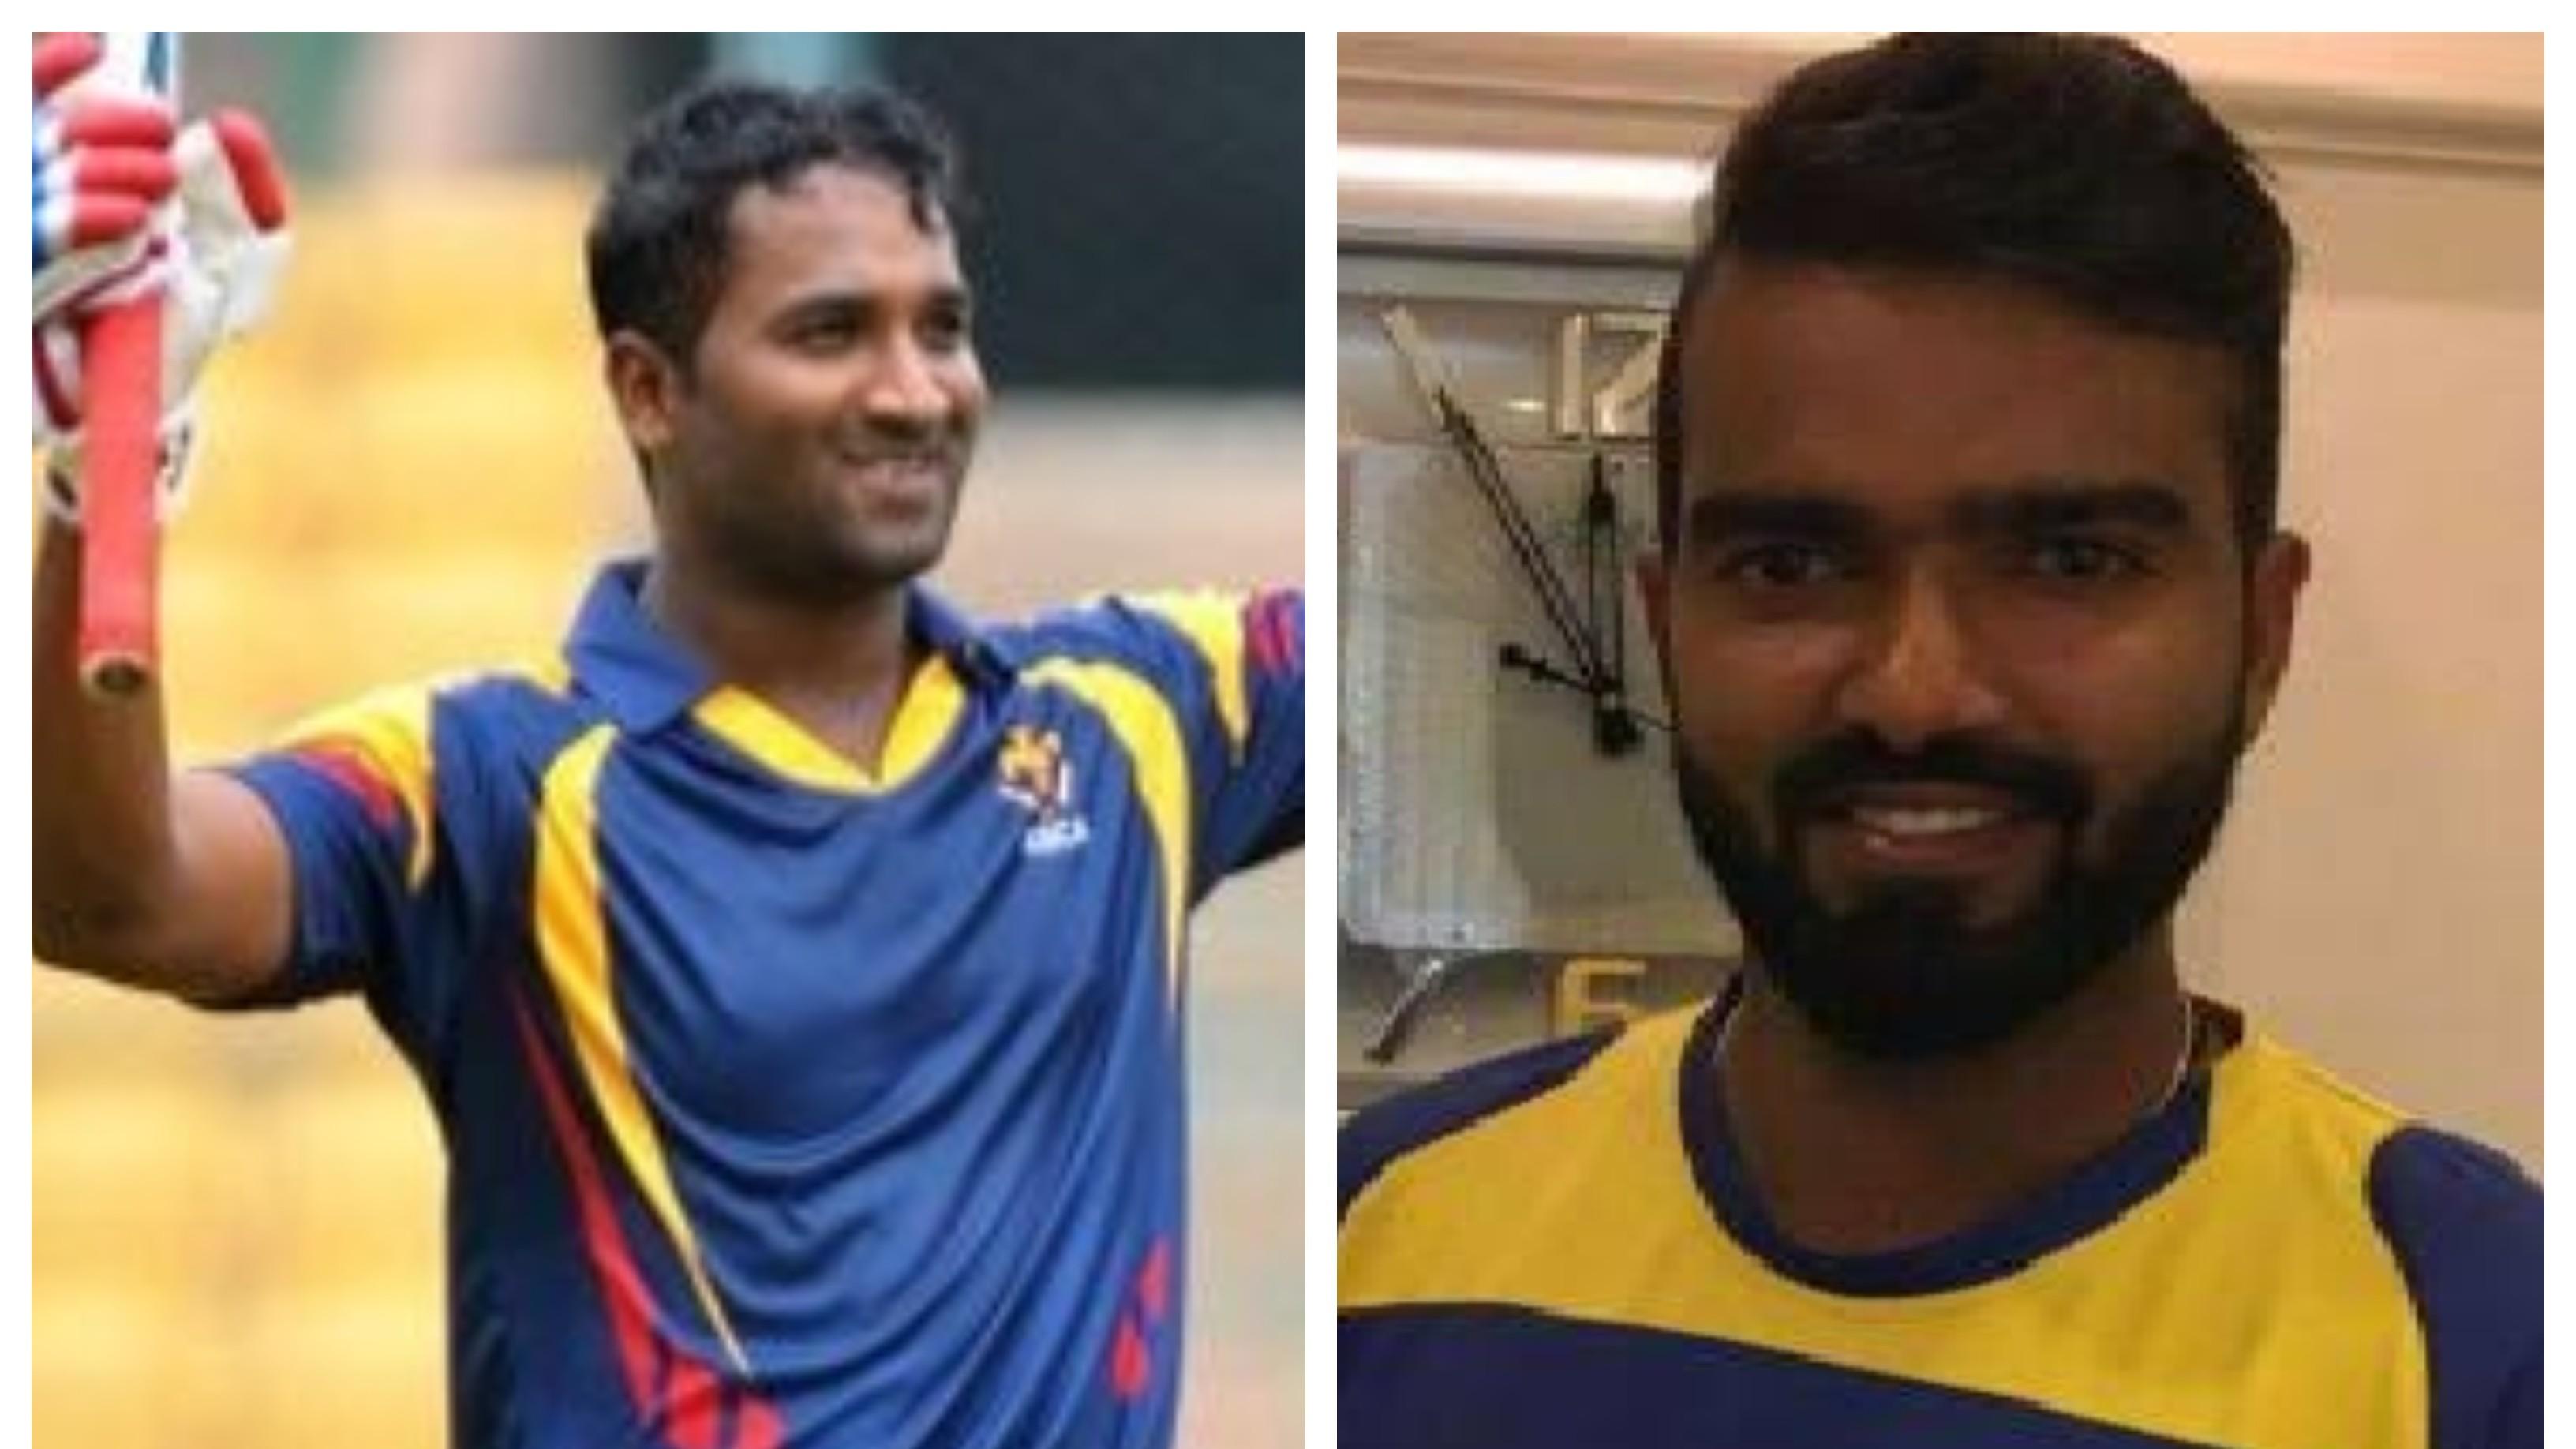 Central Crime Branch arrest CM Gautam, Abrar Kazi for their roles in KPL match-fixing saga